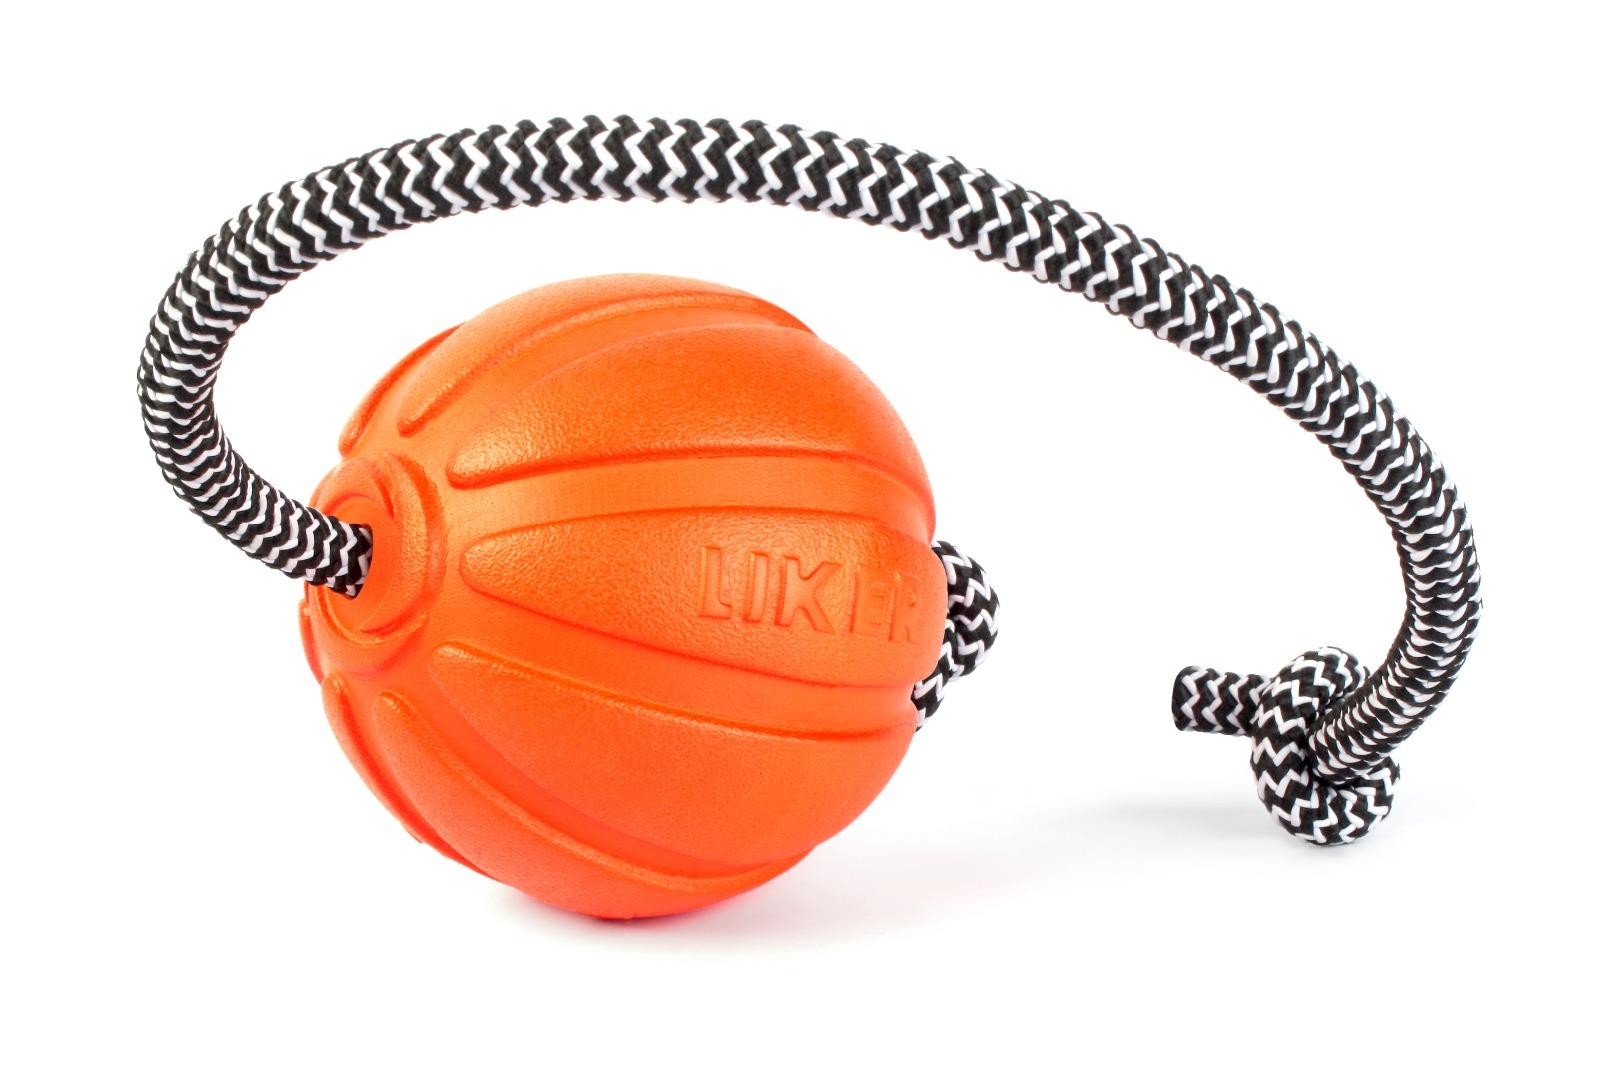 liker 6296 Liker Cord игрушка для мотивации собак, 7 см